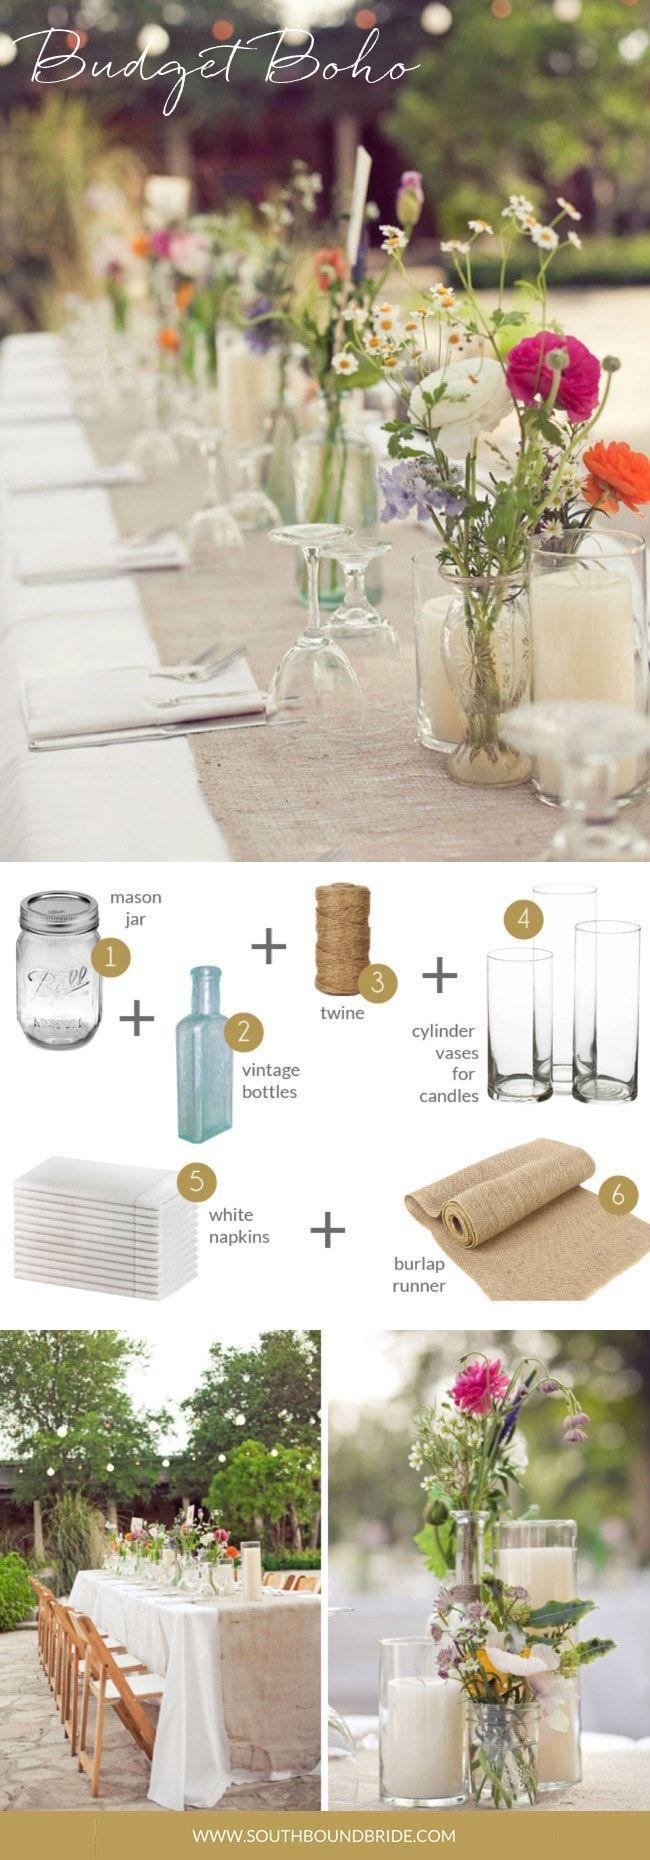 Budget Boho | How to Style a Boho Wedding Tablesca…